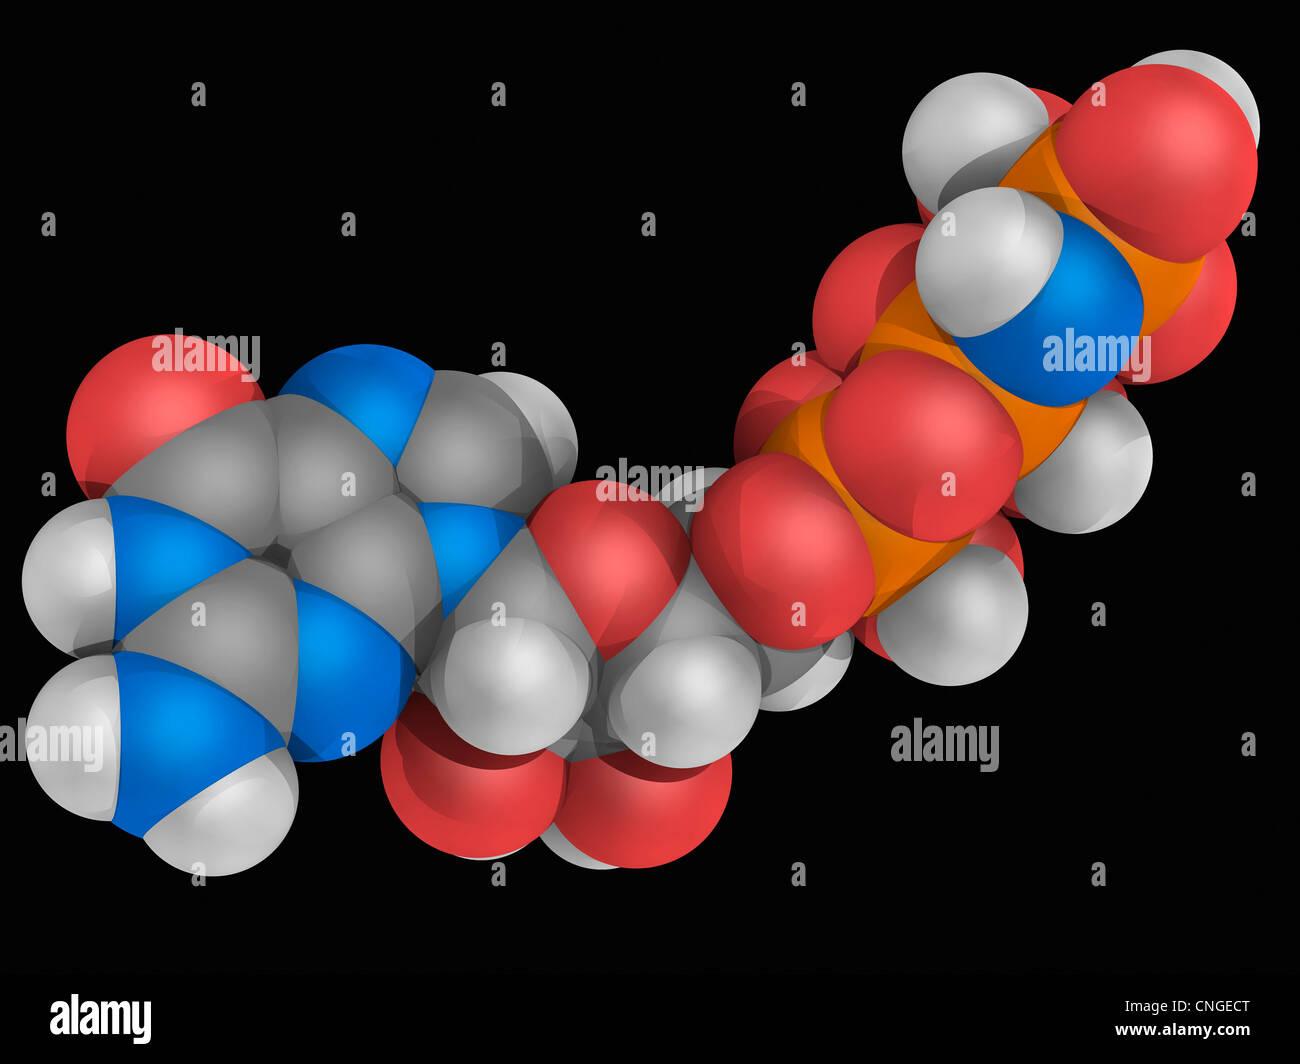 Guanylil imidodiphosphate molecule - Stock Image